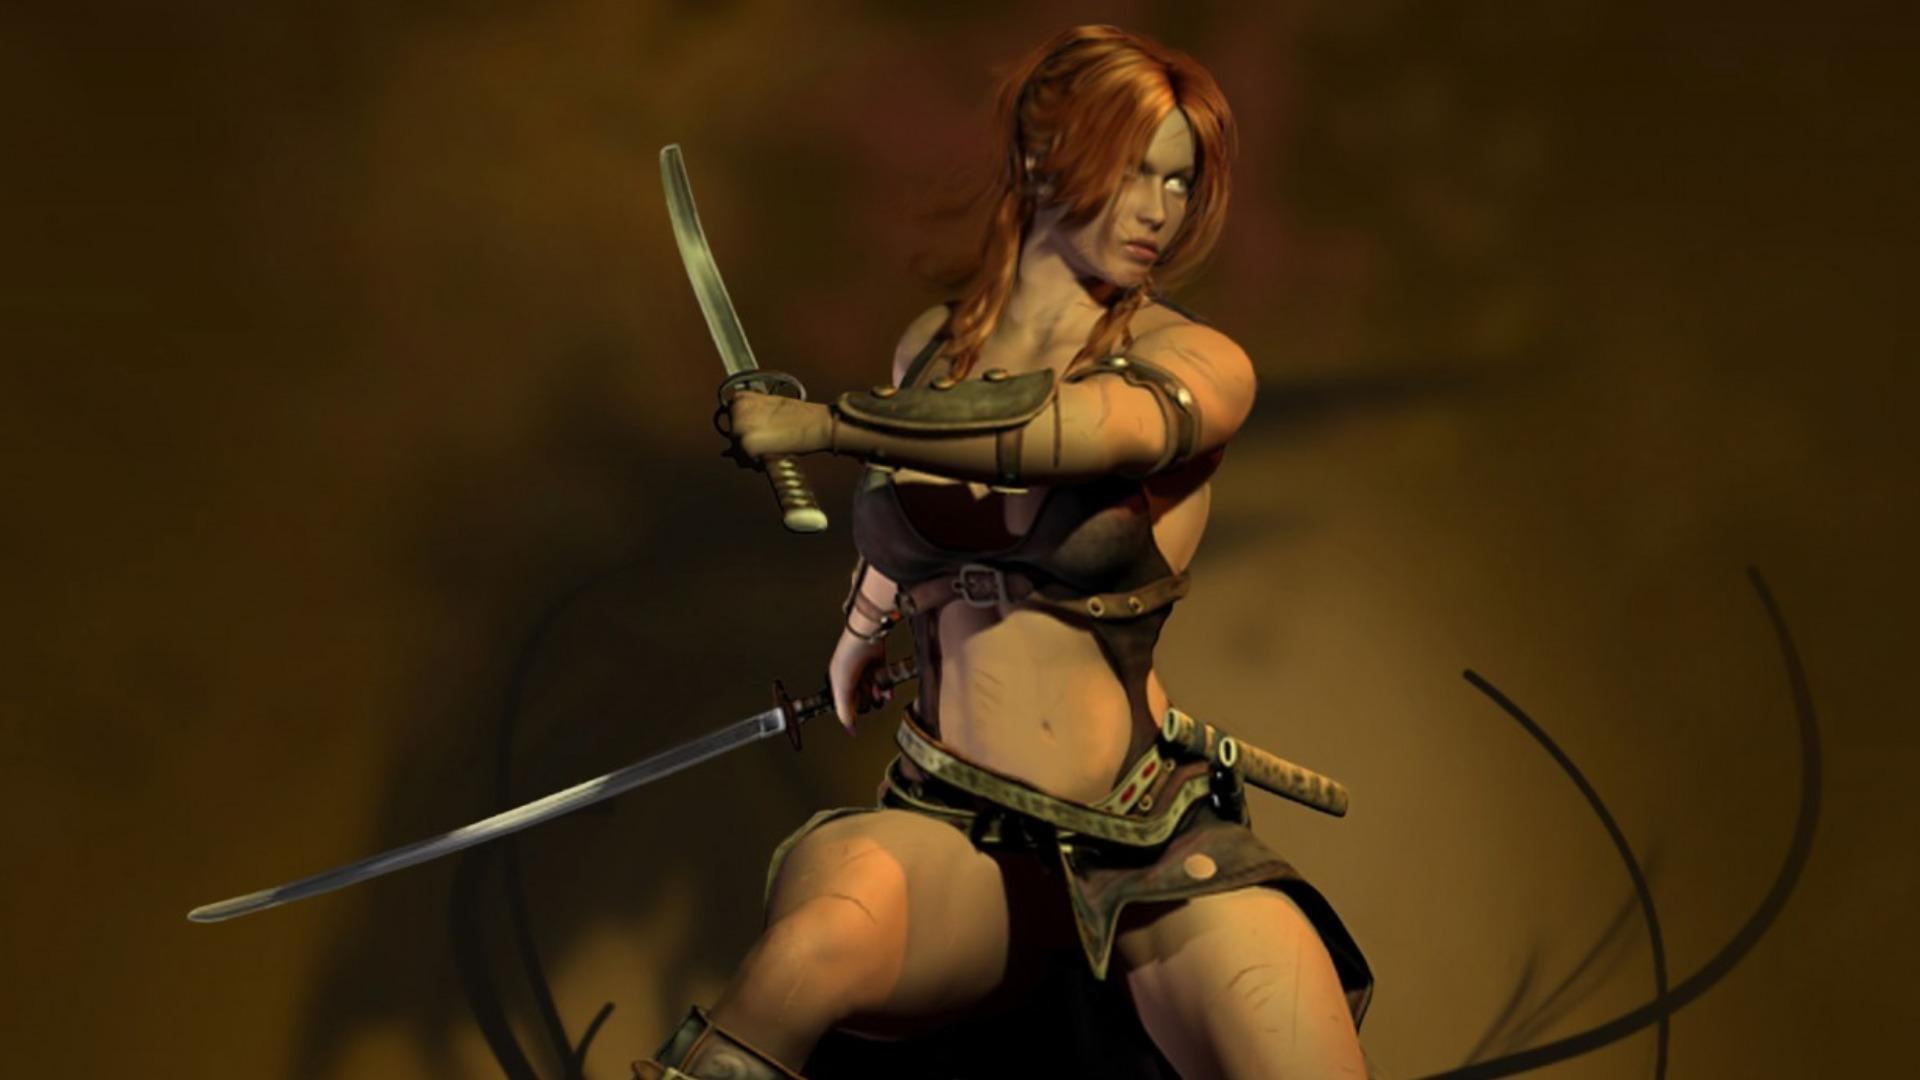 Women warrior pics art pics hentai tube